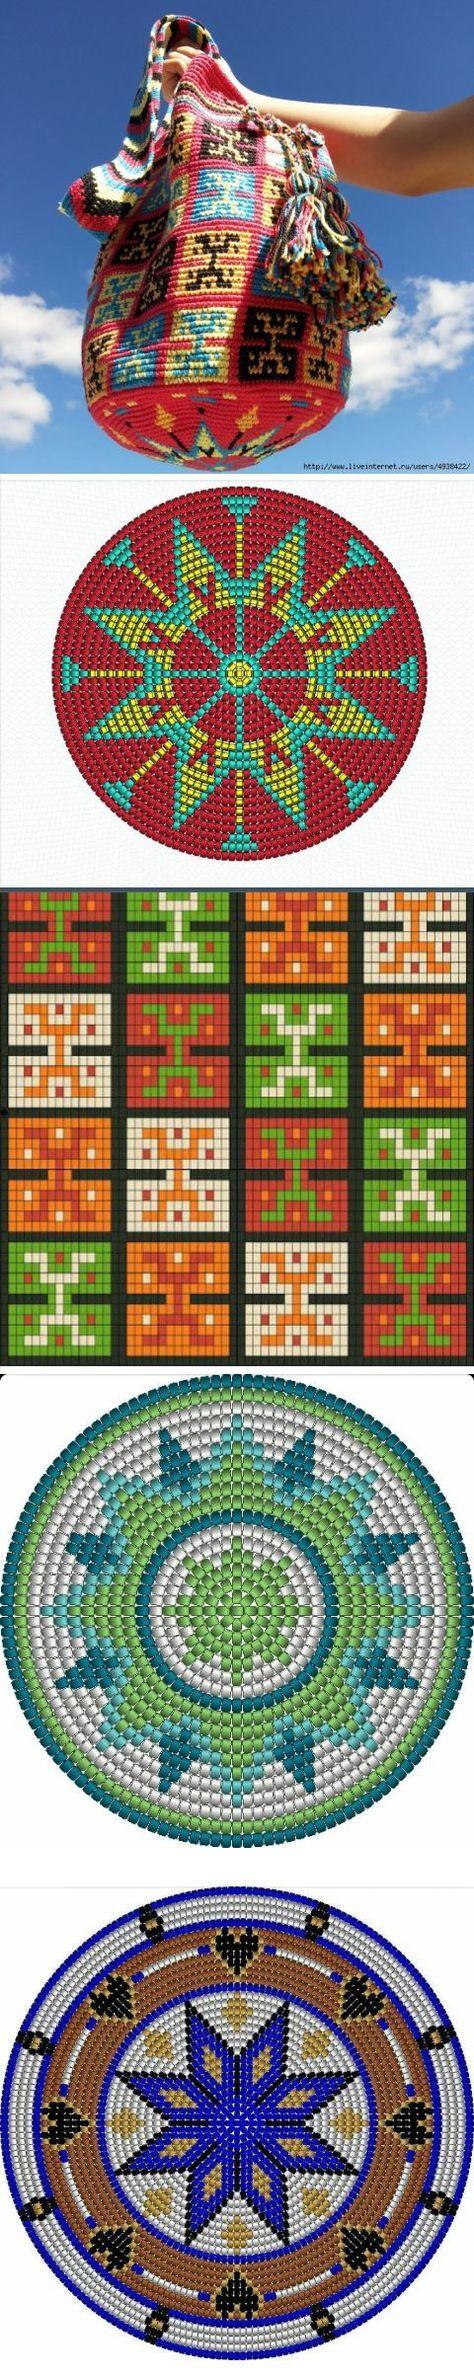 Сумки Вайуу - колумбийские mochilla.